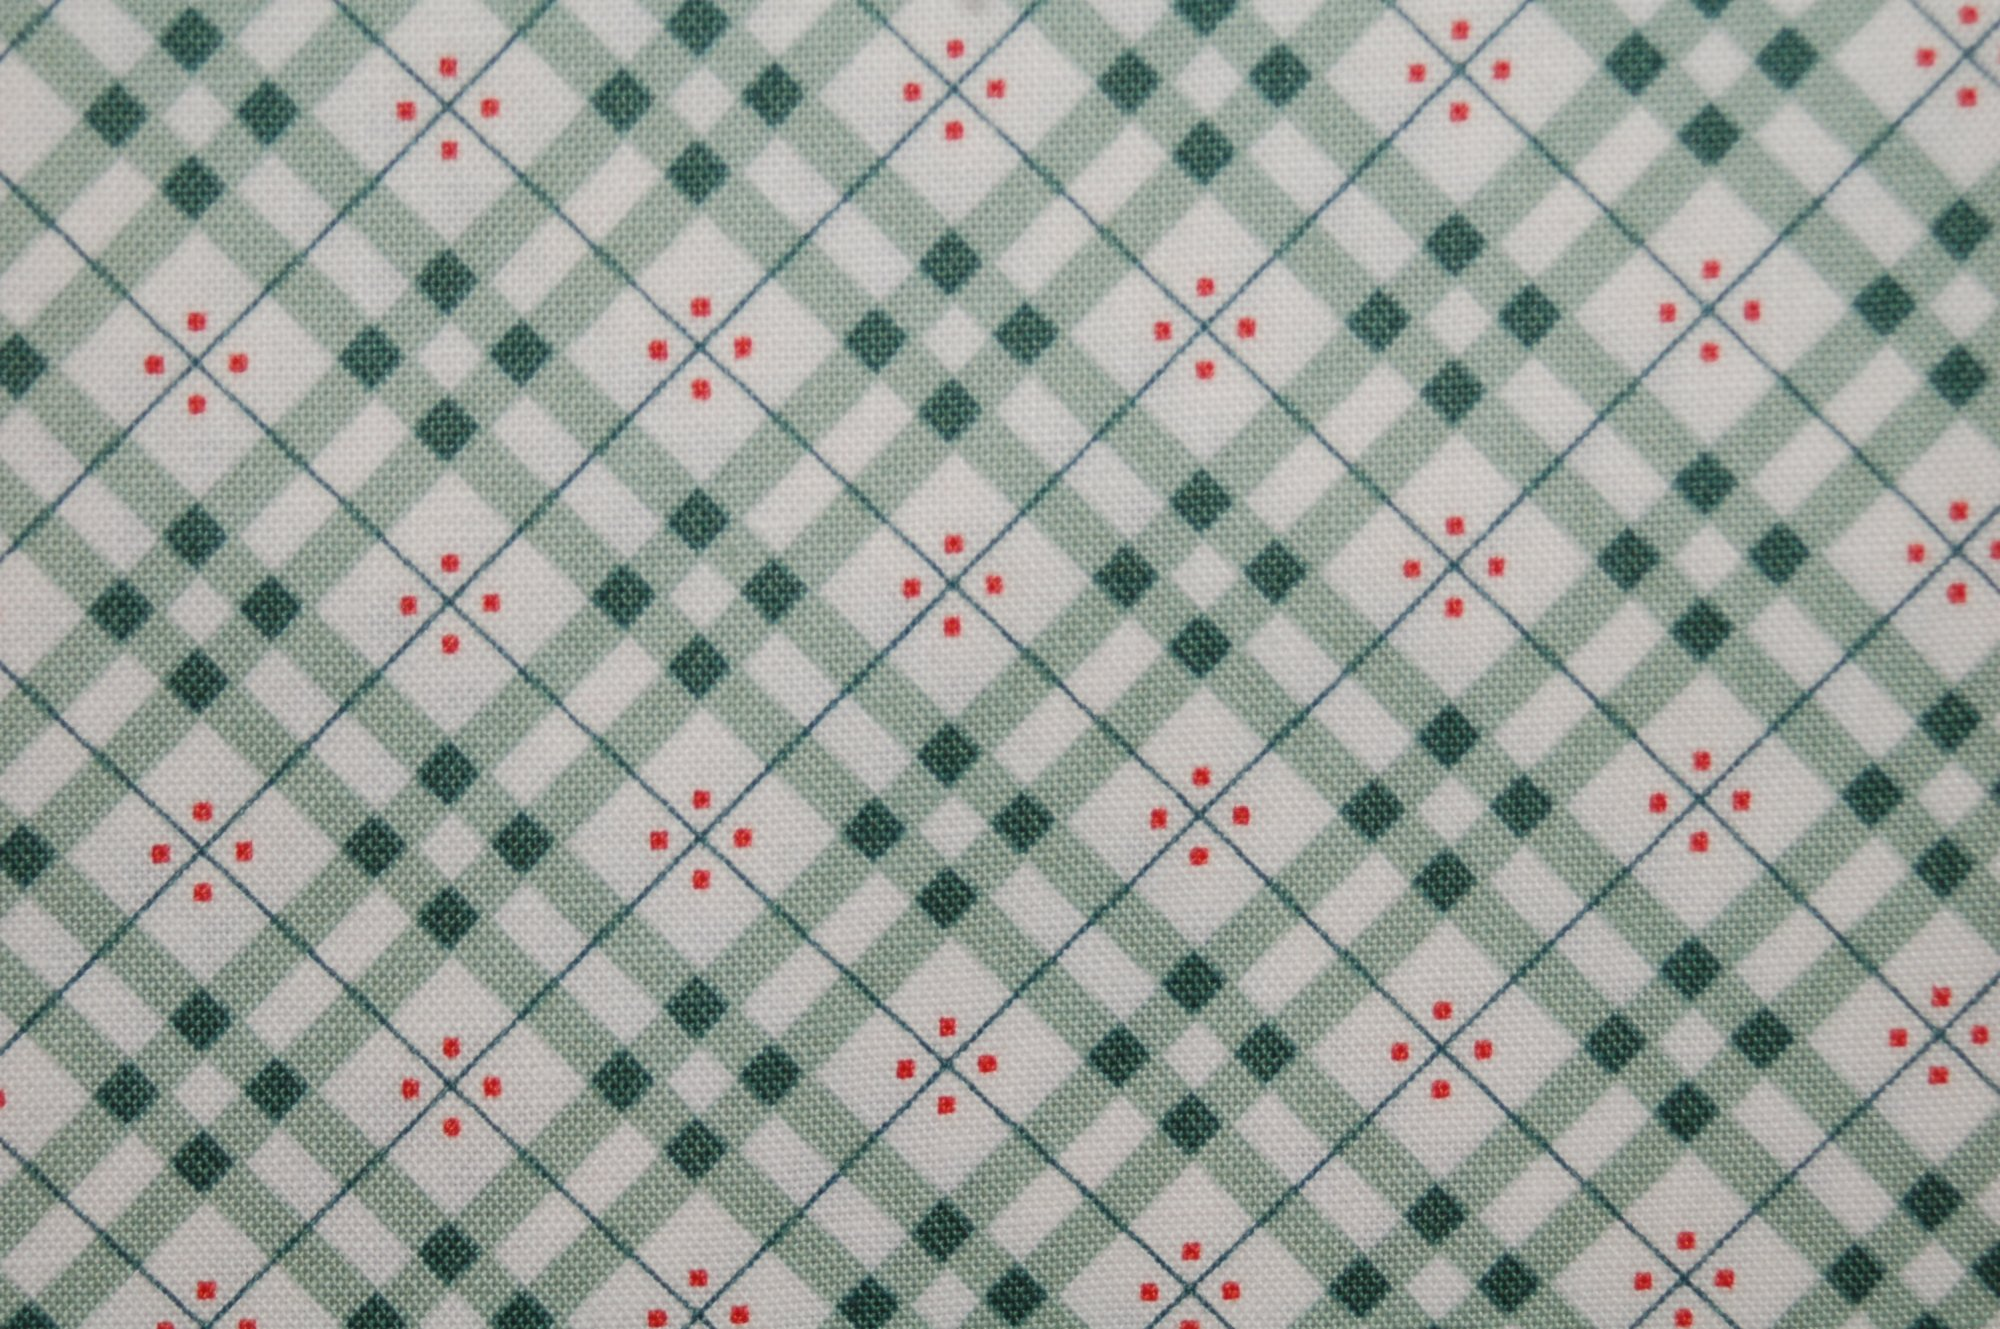 Eastham - Fine Plaid (Juniper) from Denyse Schmidt for Free Spirit Fabrics